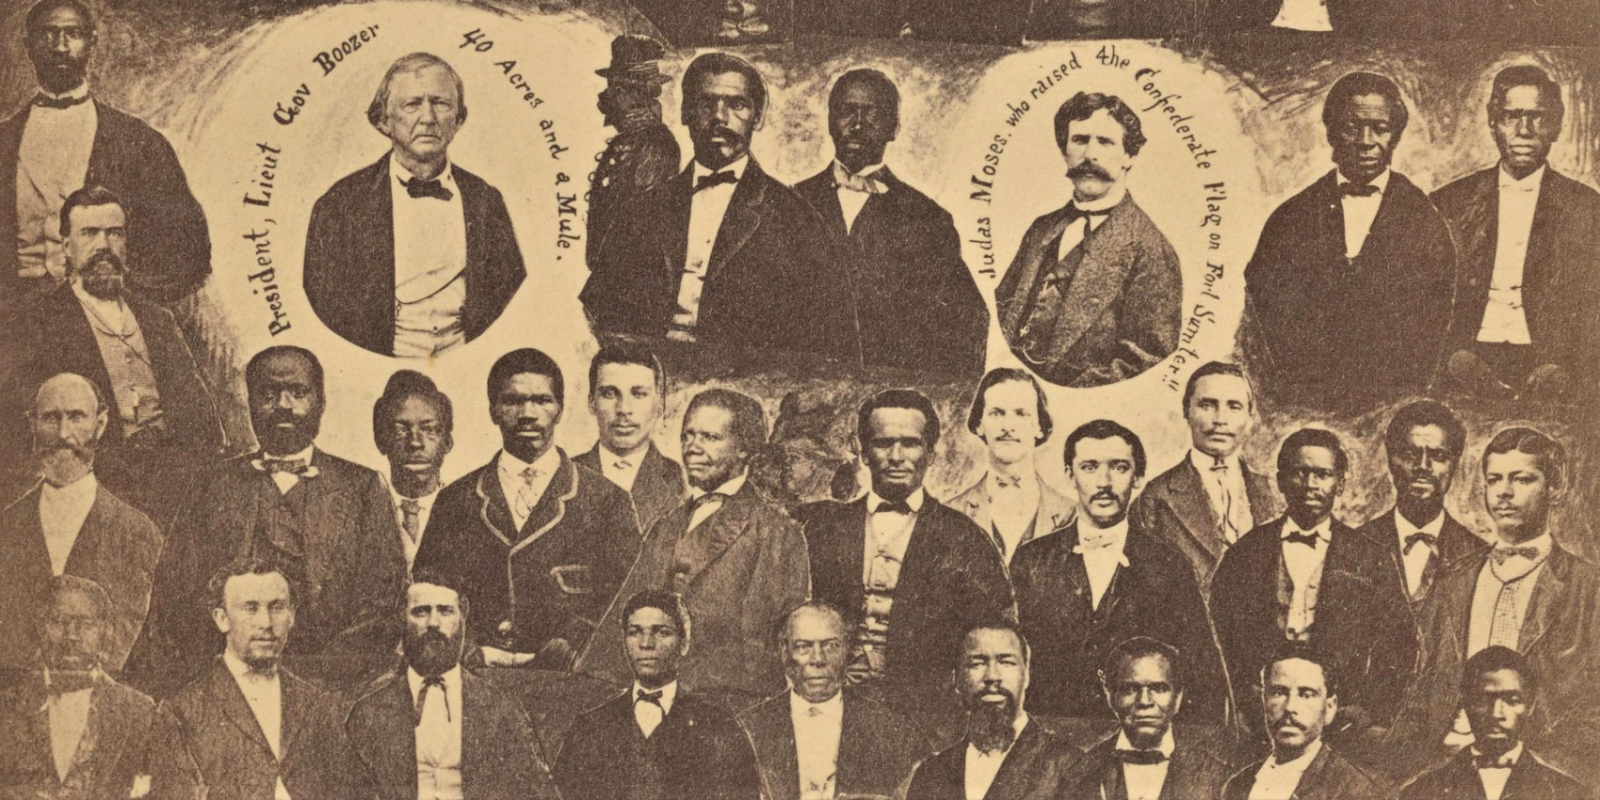 Radical members of the South Carolina Legislature | Graphic Arts